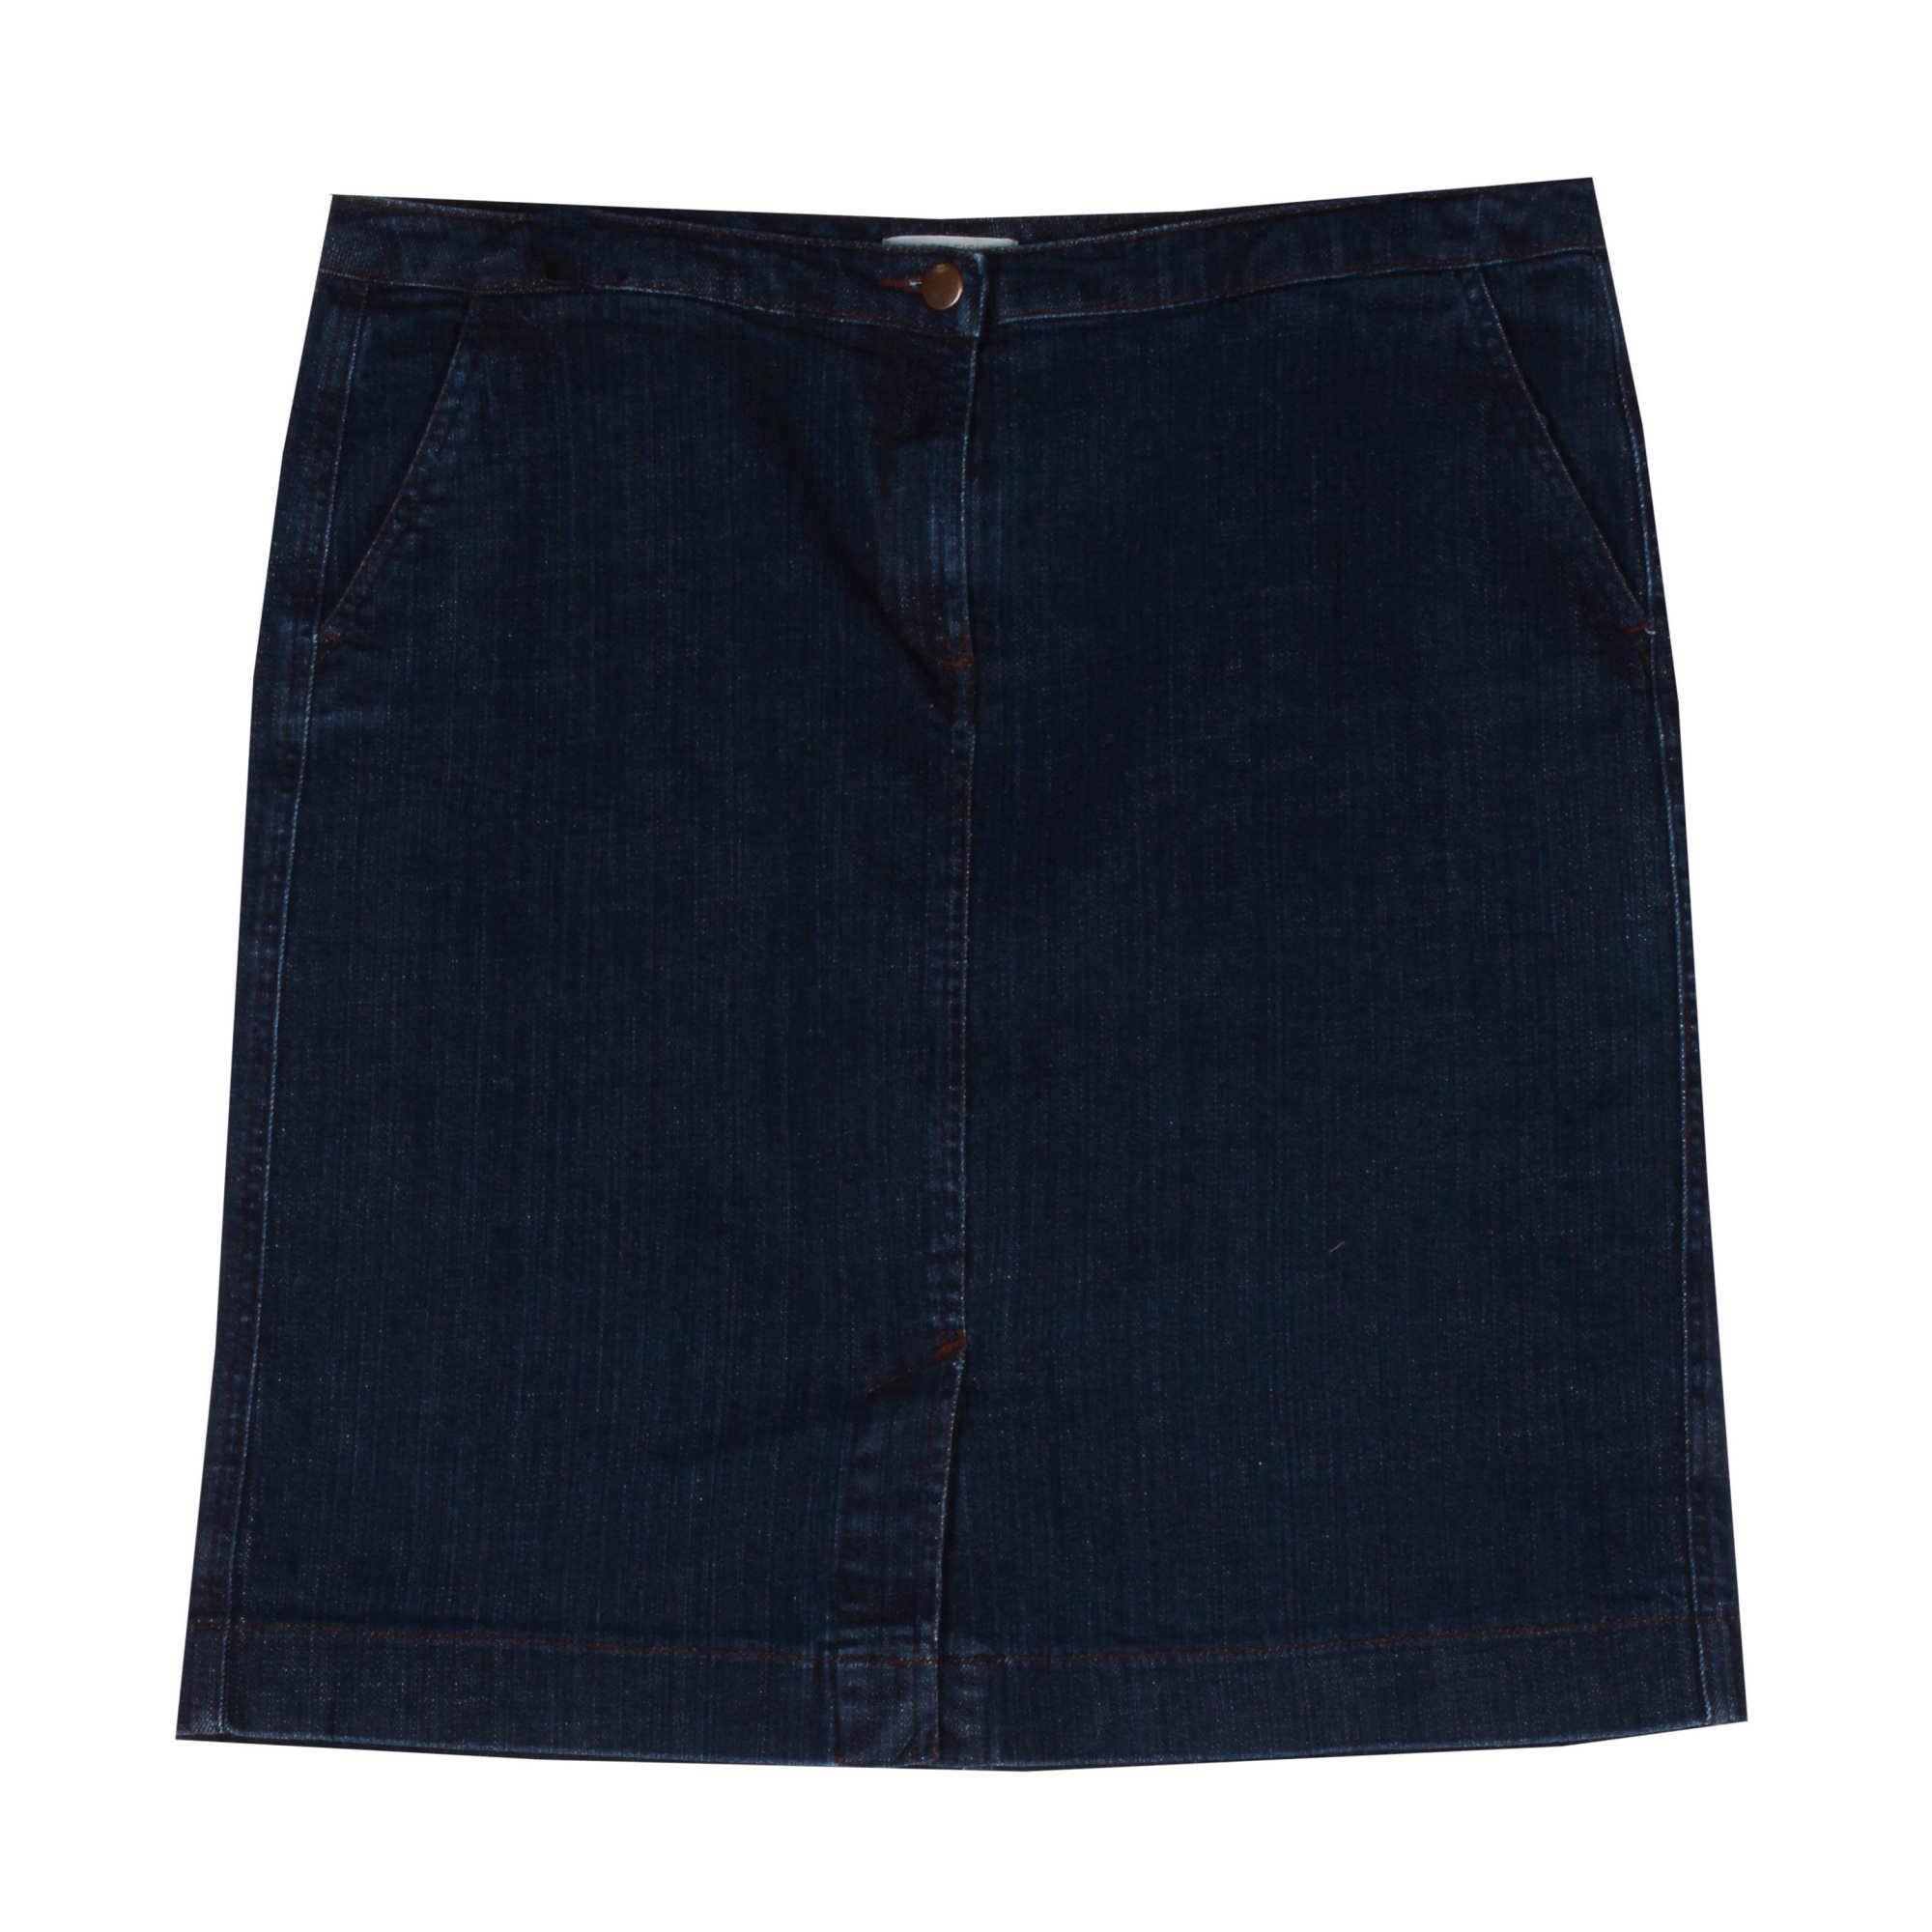 Organic Cotton Stretch Denim Skirt